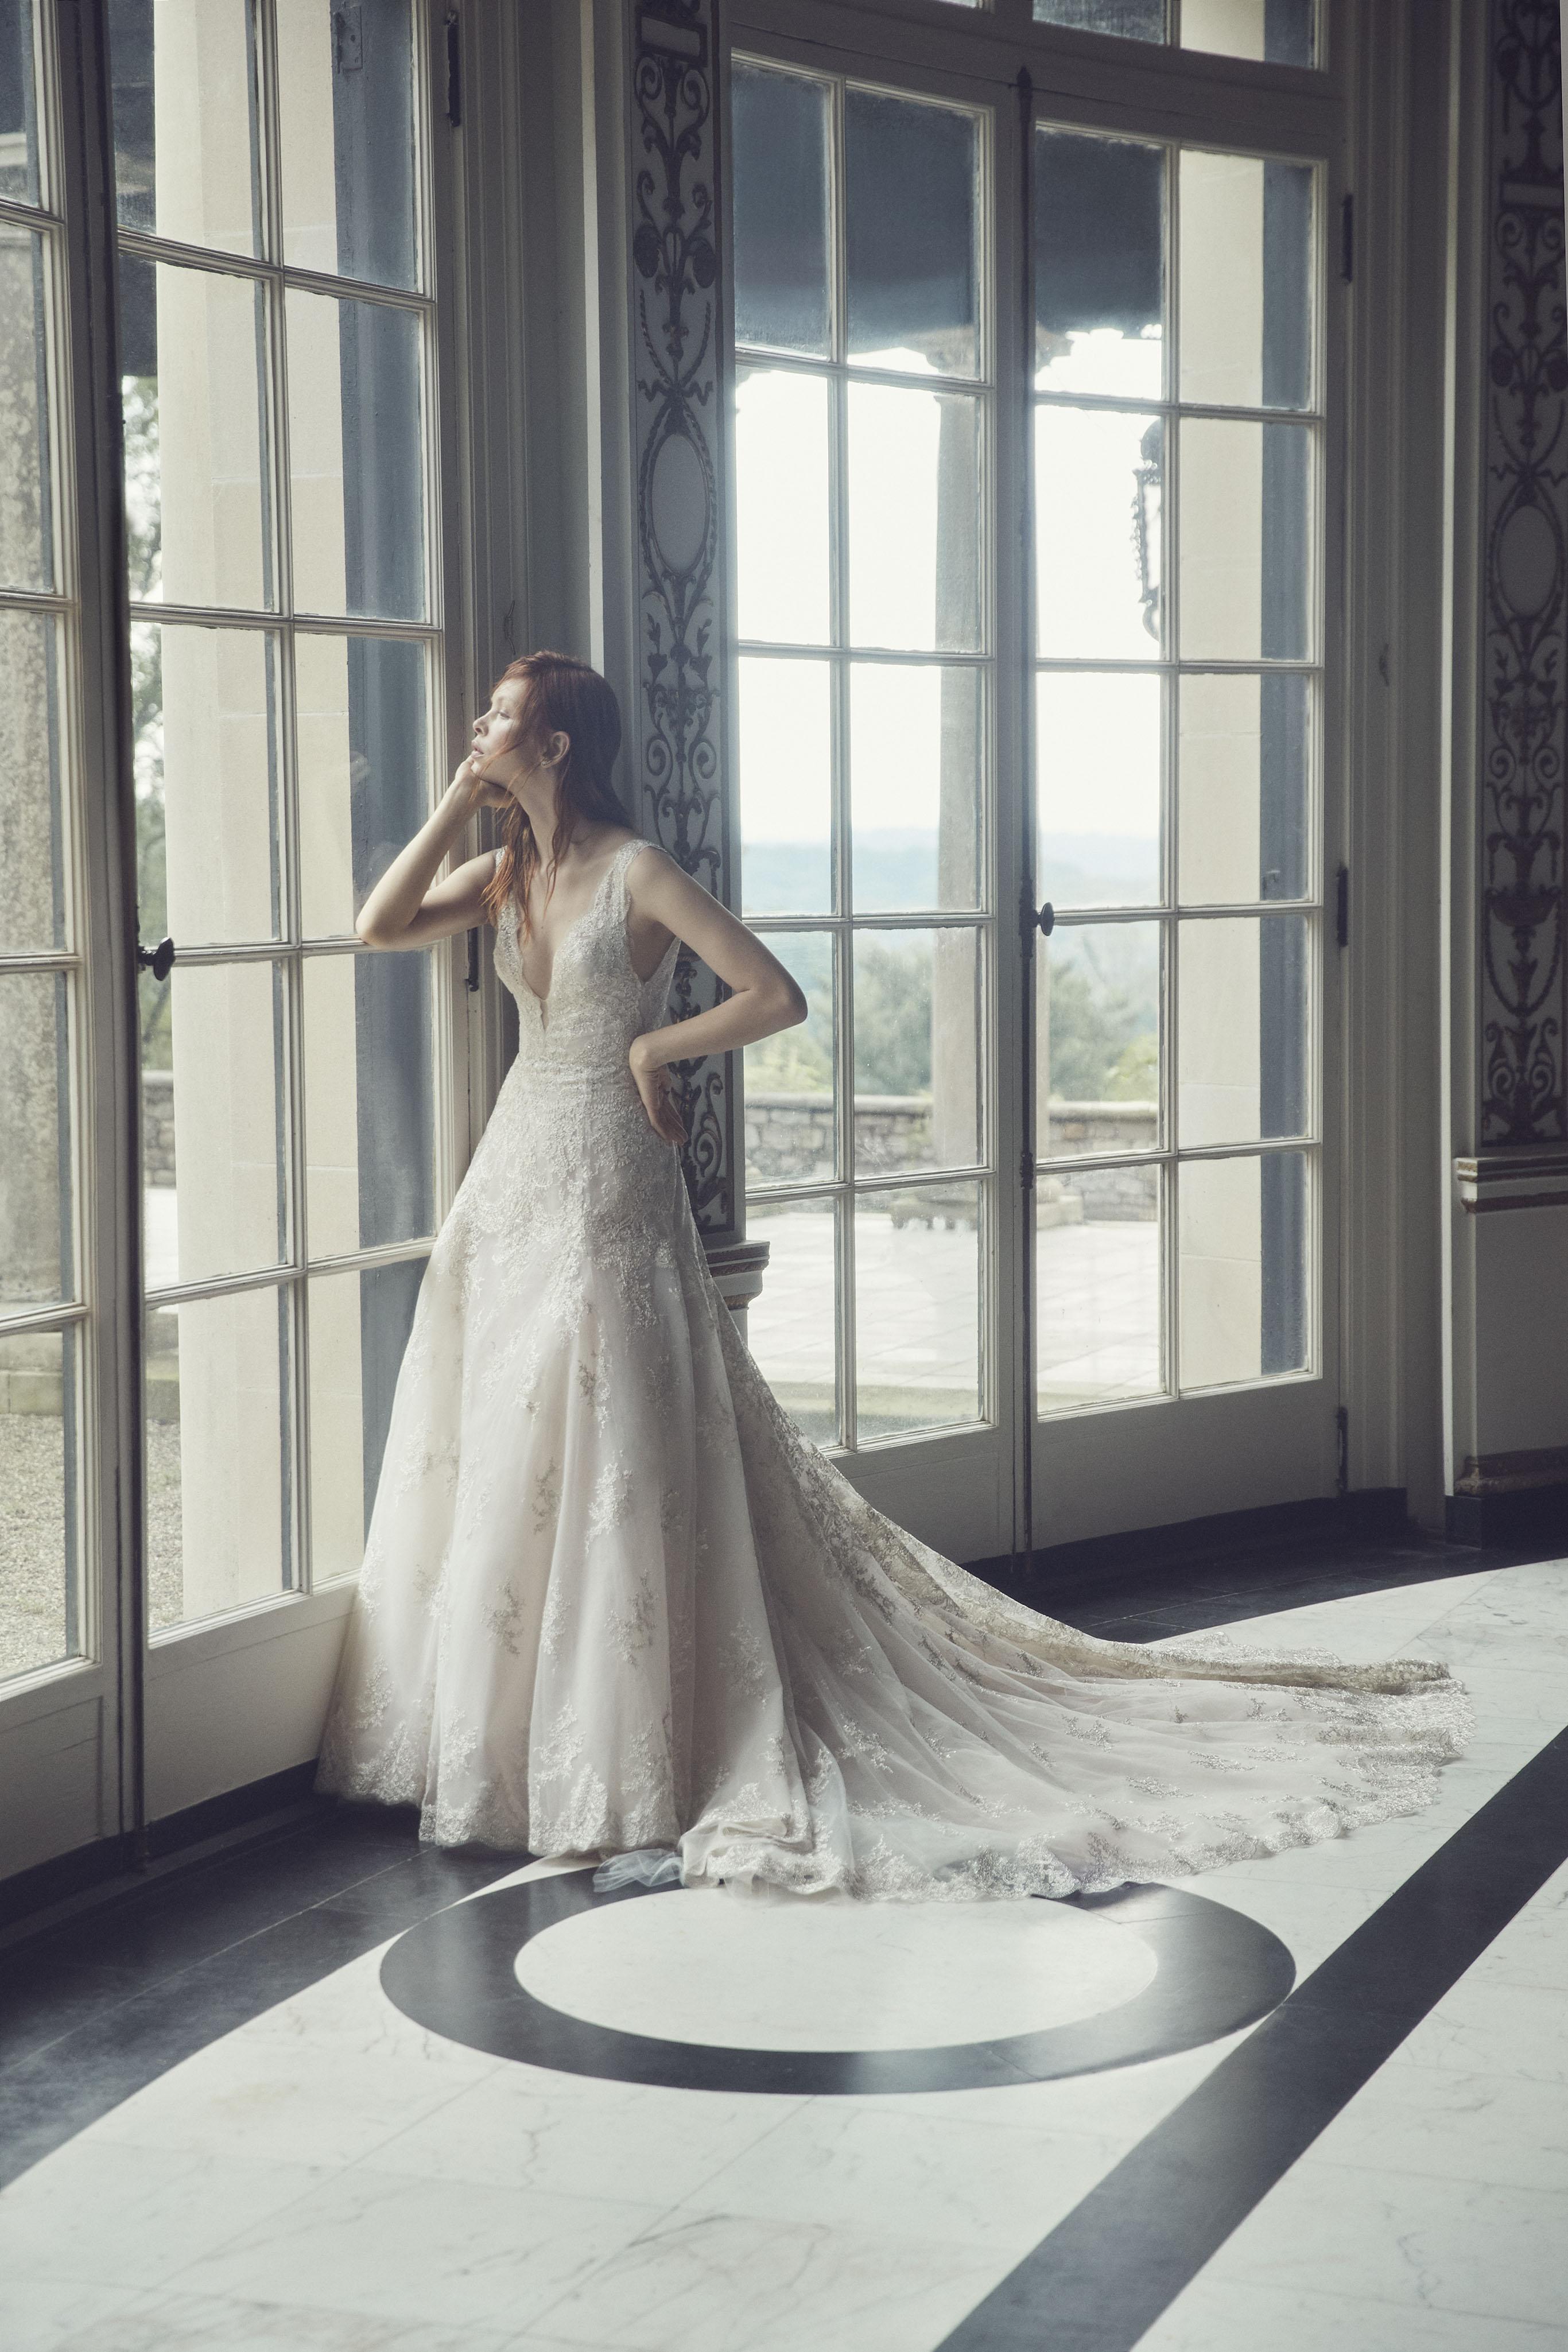 monique lhuillier fall 2019 a-line dress with train